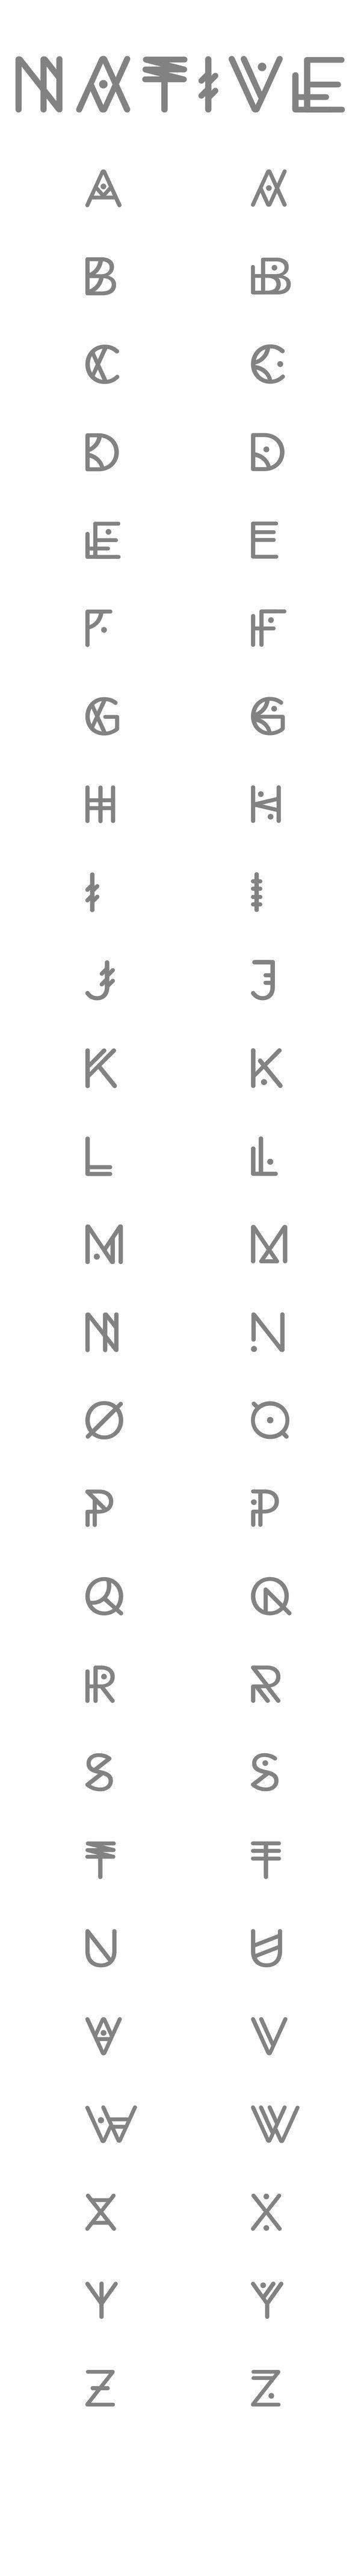 Tattoo name writing designs daniel mcqueen  planner  pinterest  mcqueen fonts and bullet